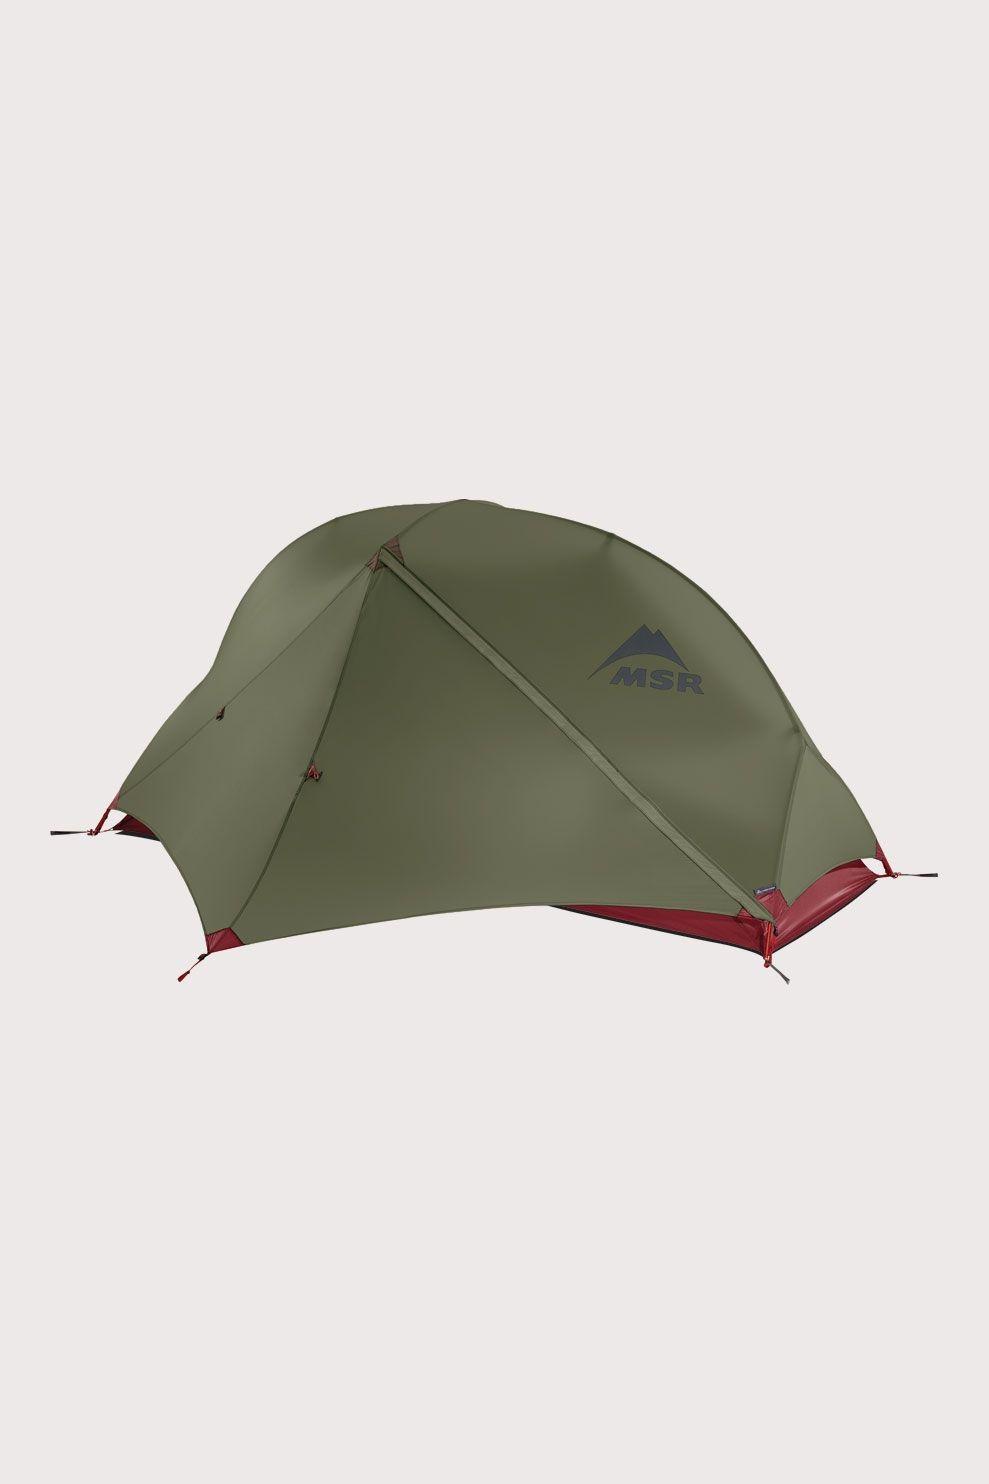 MSR Hubba NX 1-Persoons Hybride tent Groen